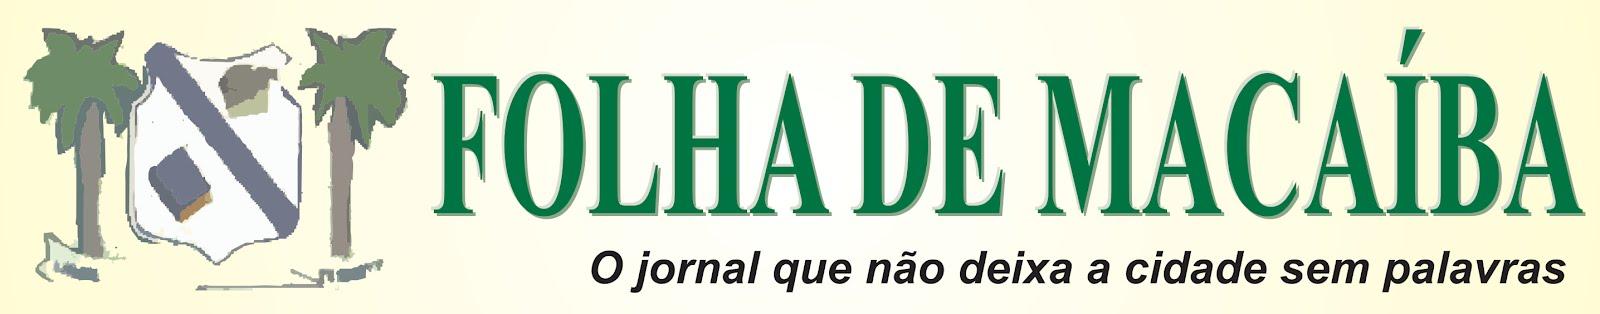 Folha de Macaiba